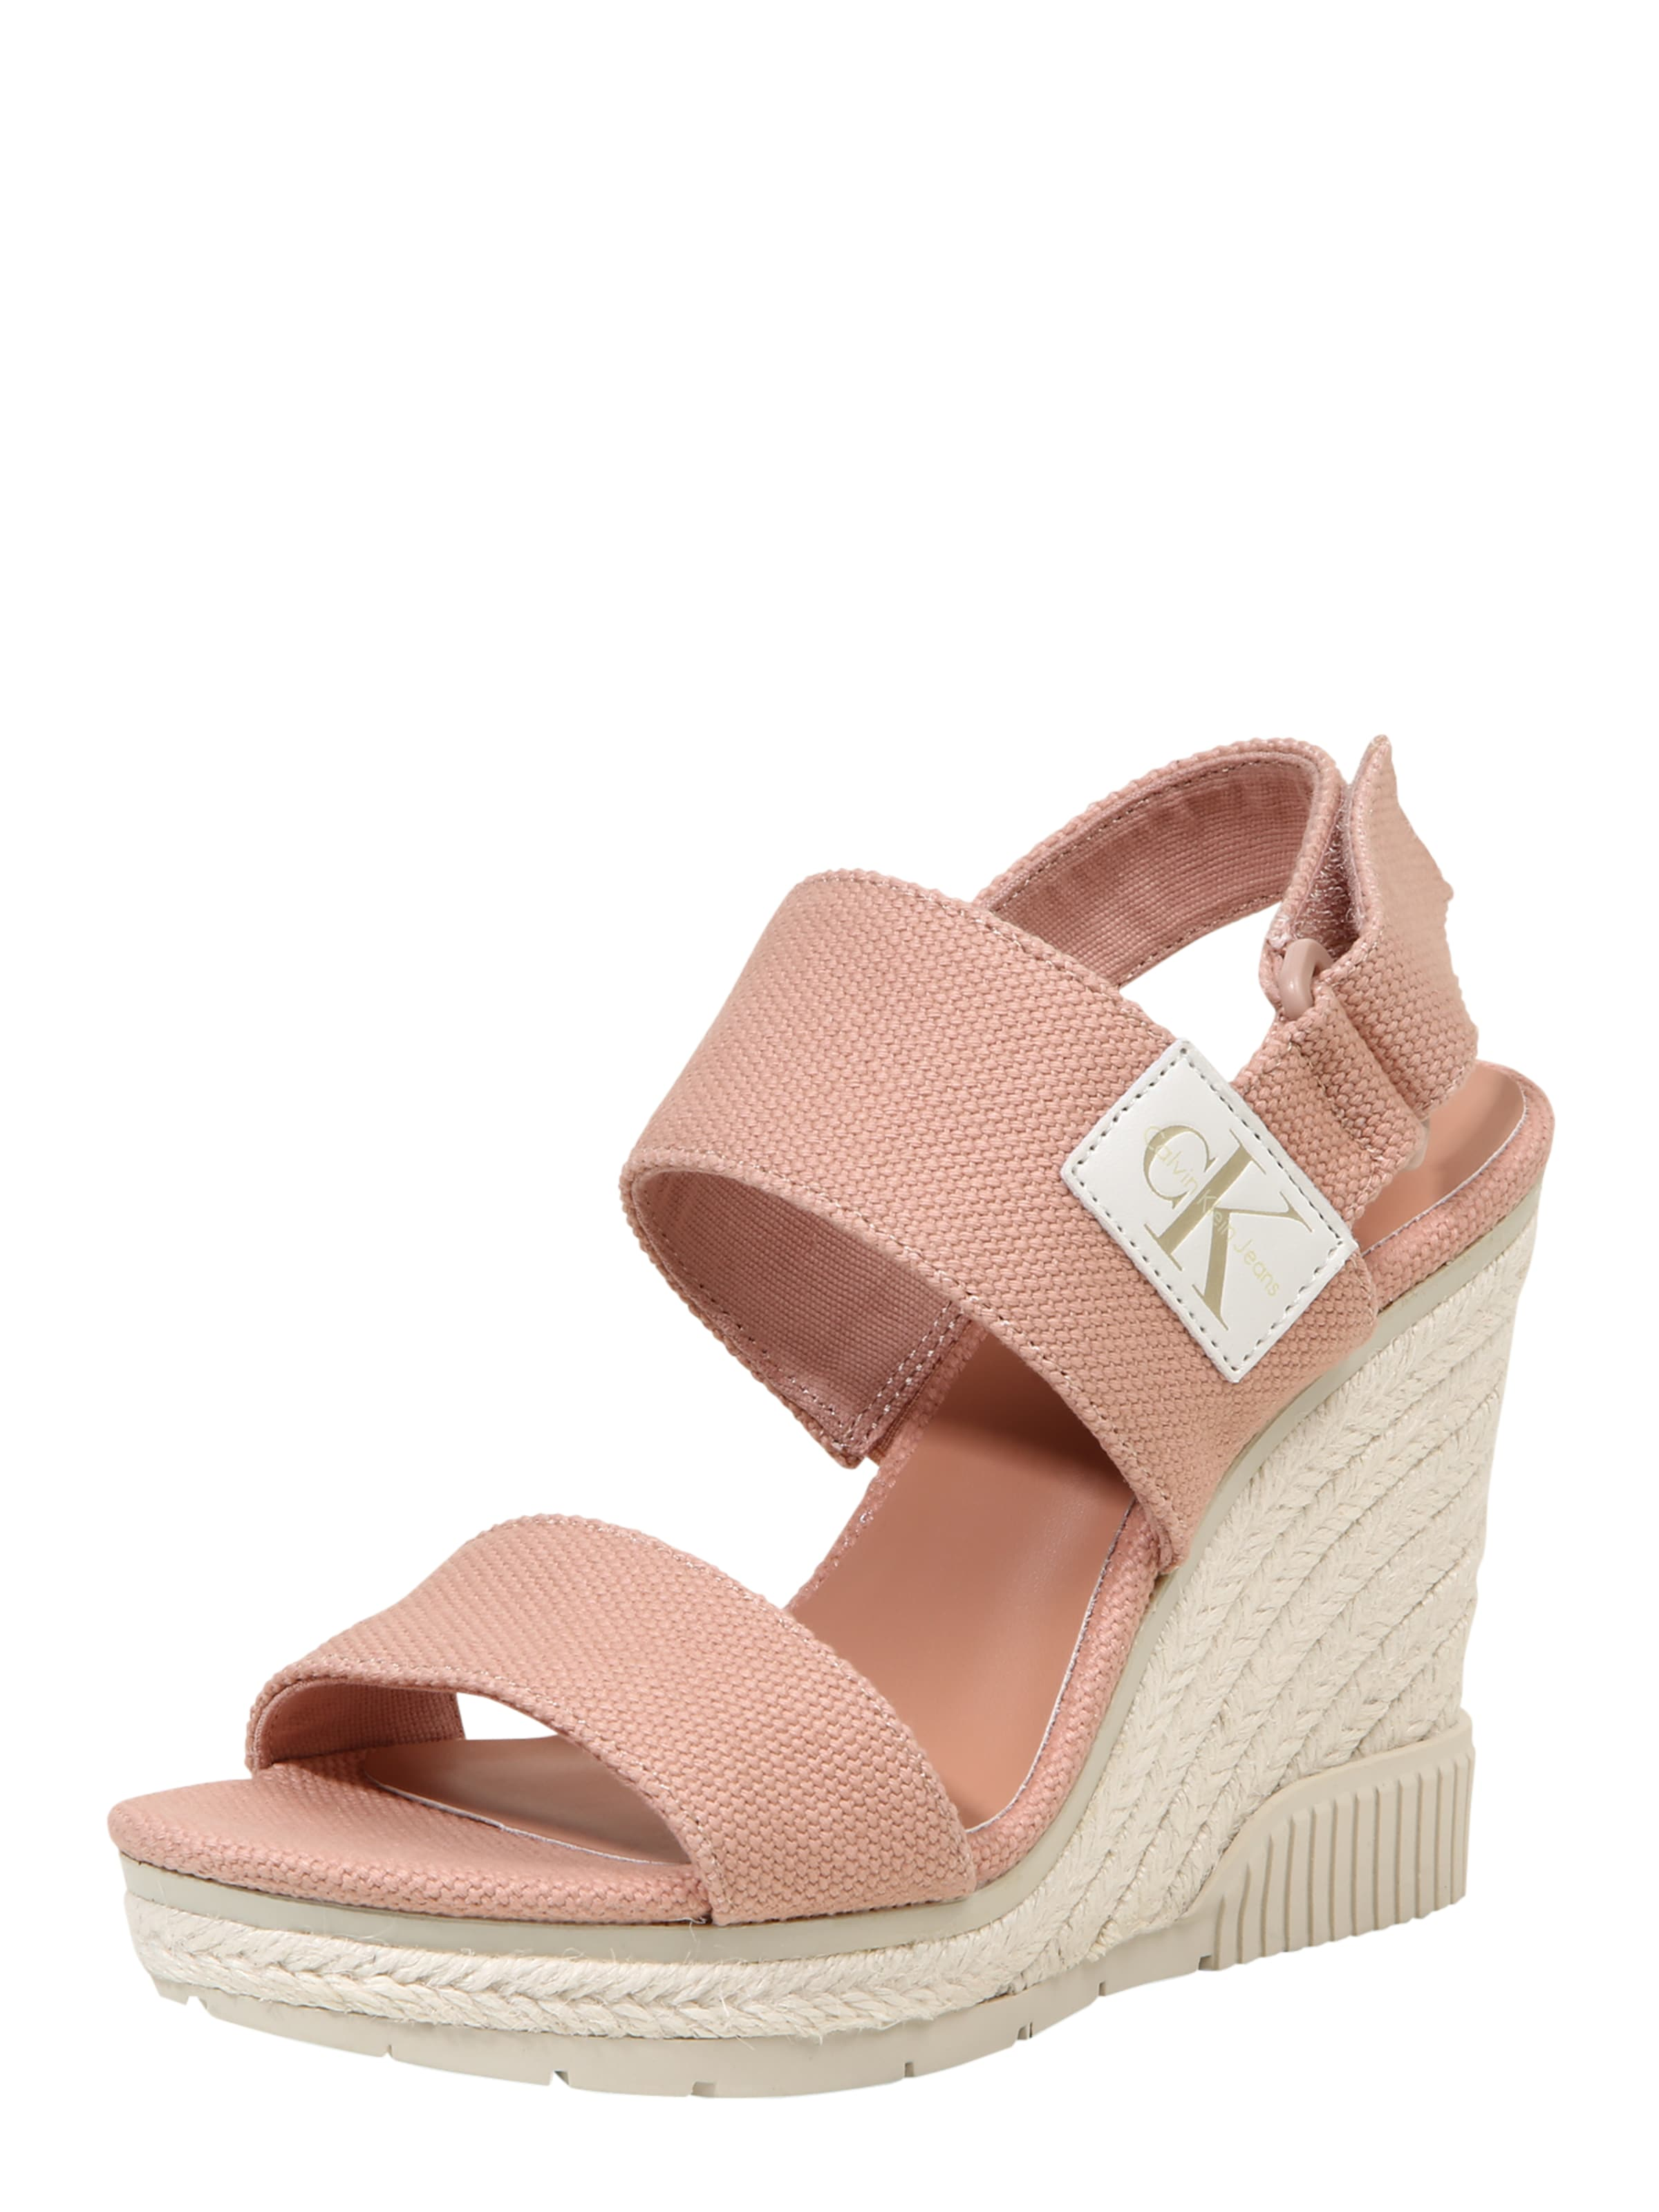 Calvin Klein Jeans | Keilsandale 'LACEY' Schuhe Gut getragene Schuhe